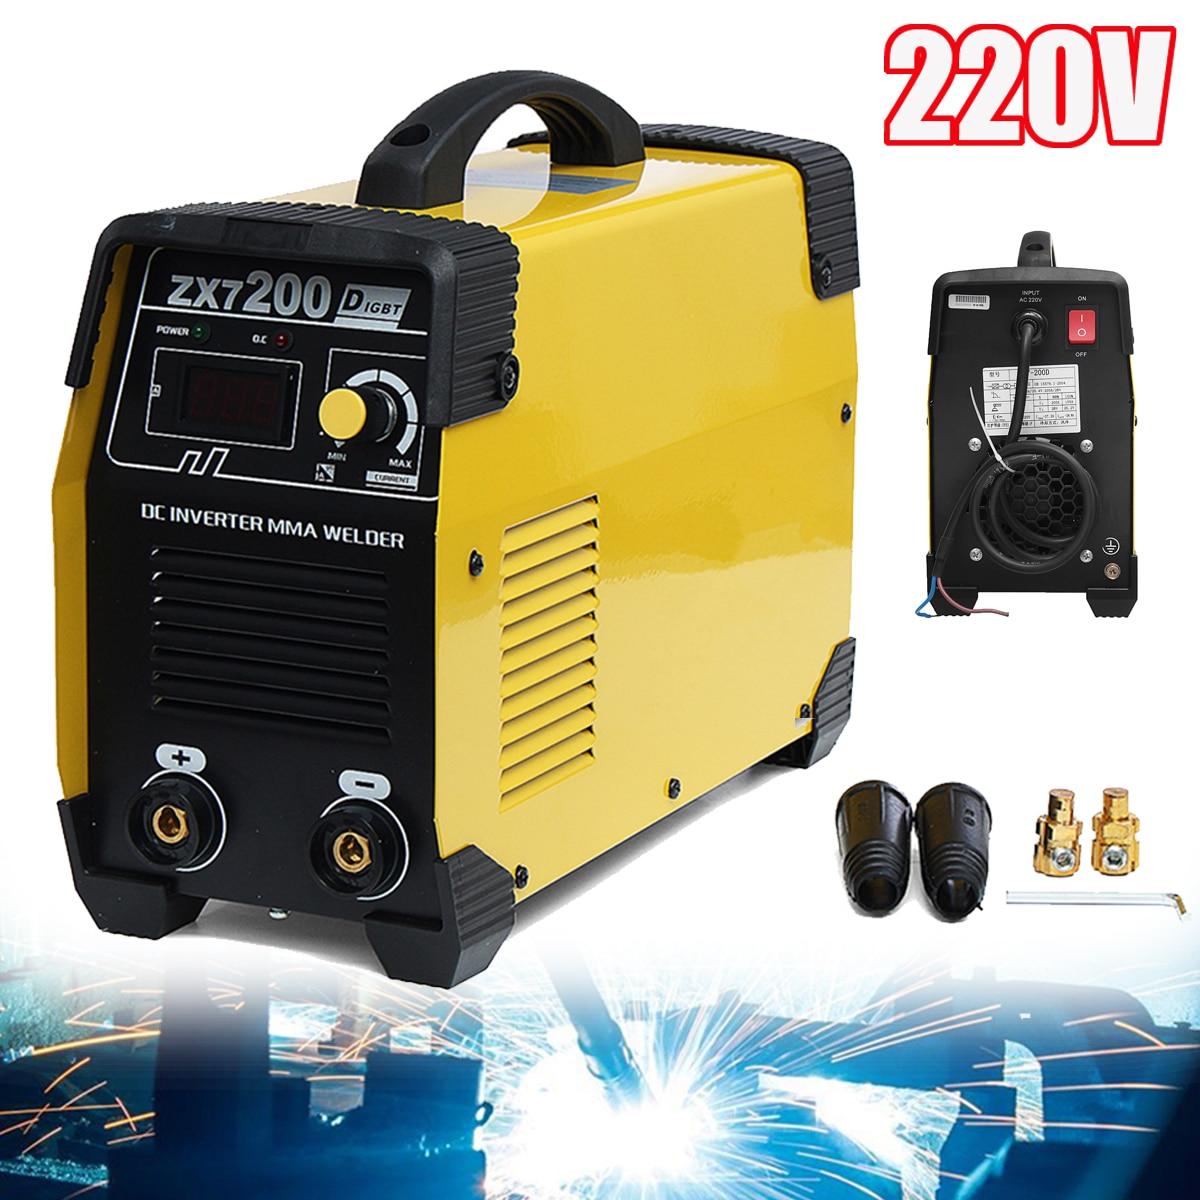 220v Zx7-200 Dc Inverter Welding Equipment Portable Welder Machine U Cnc, Metalworking & Manufacturing Business & Industrial